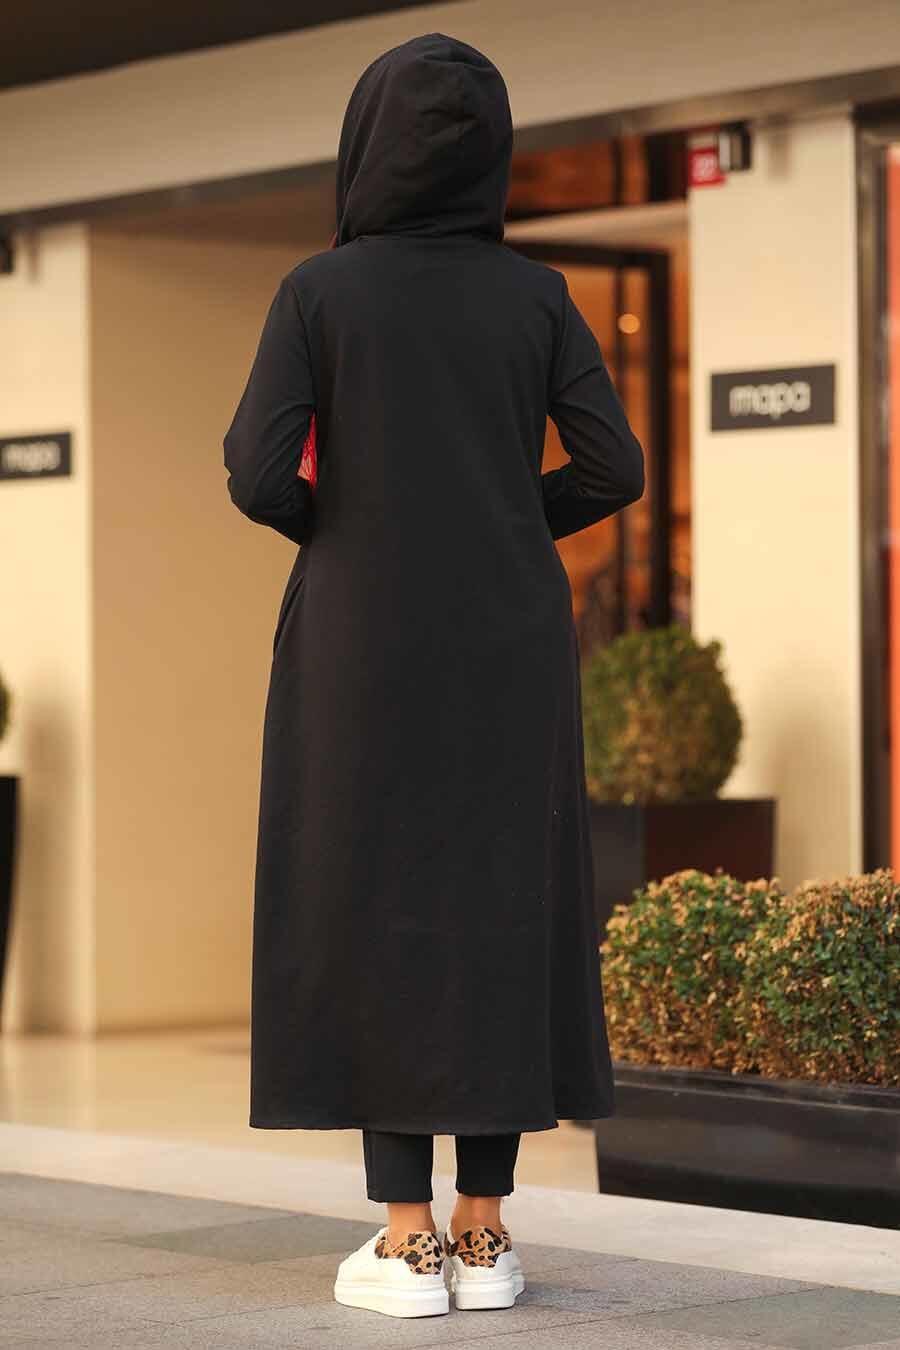 Neva Style - Black Hijab Tunic 22560S